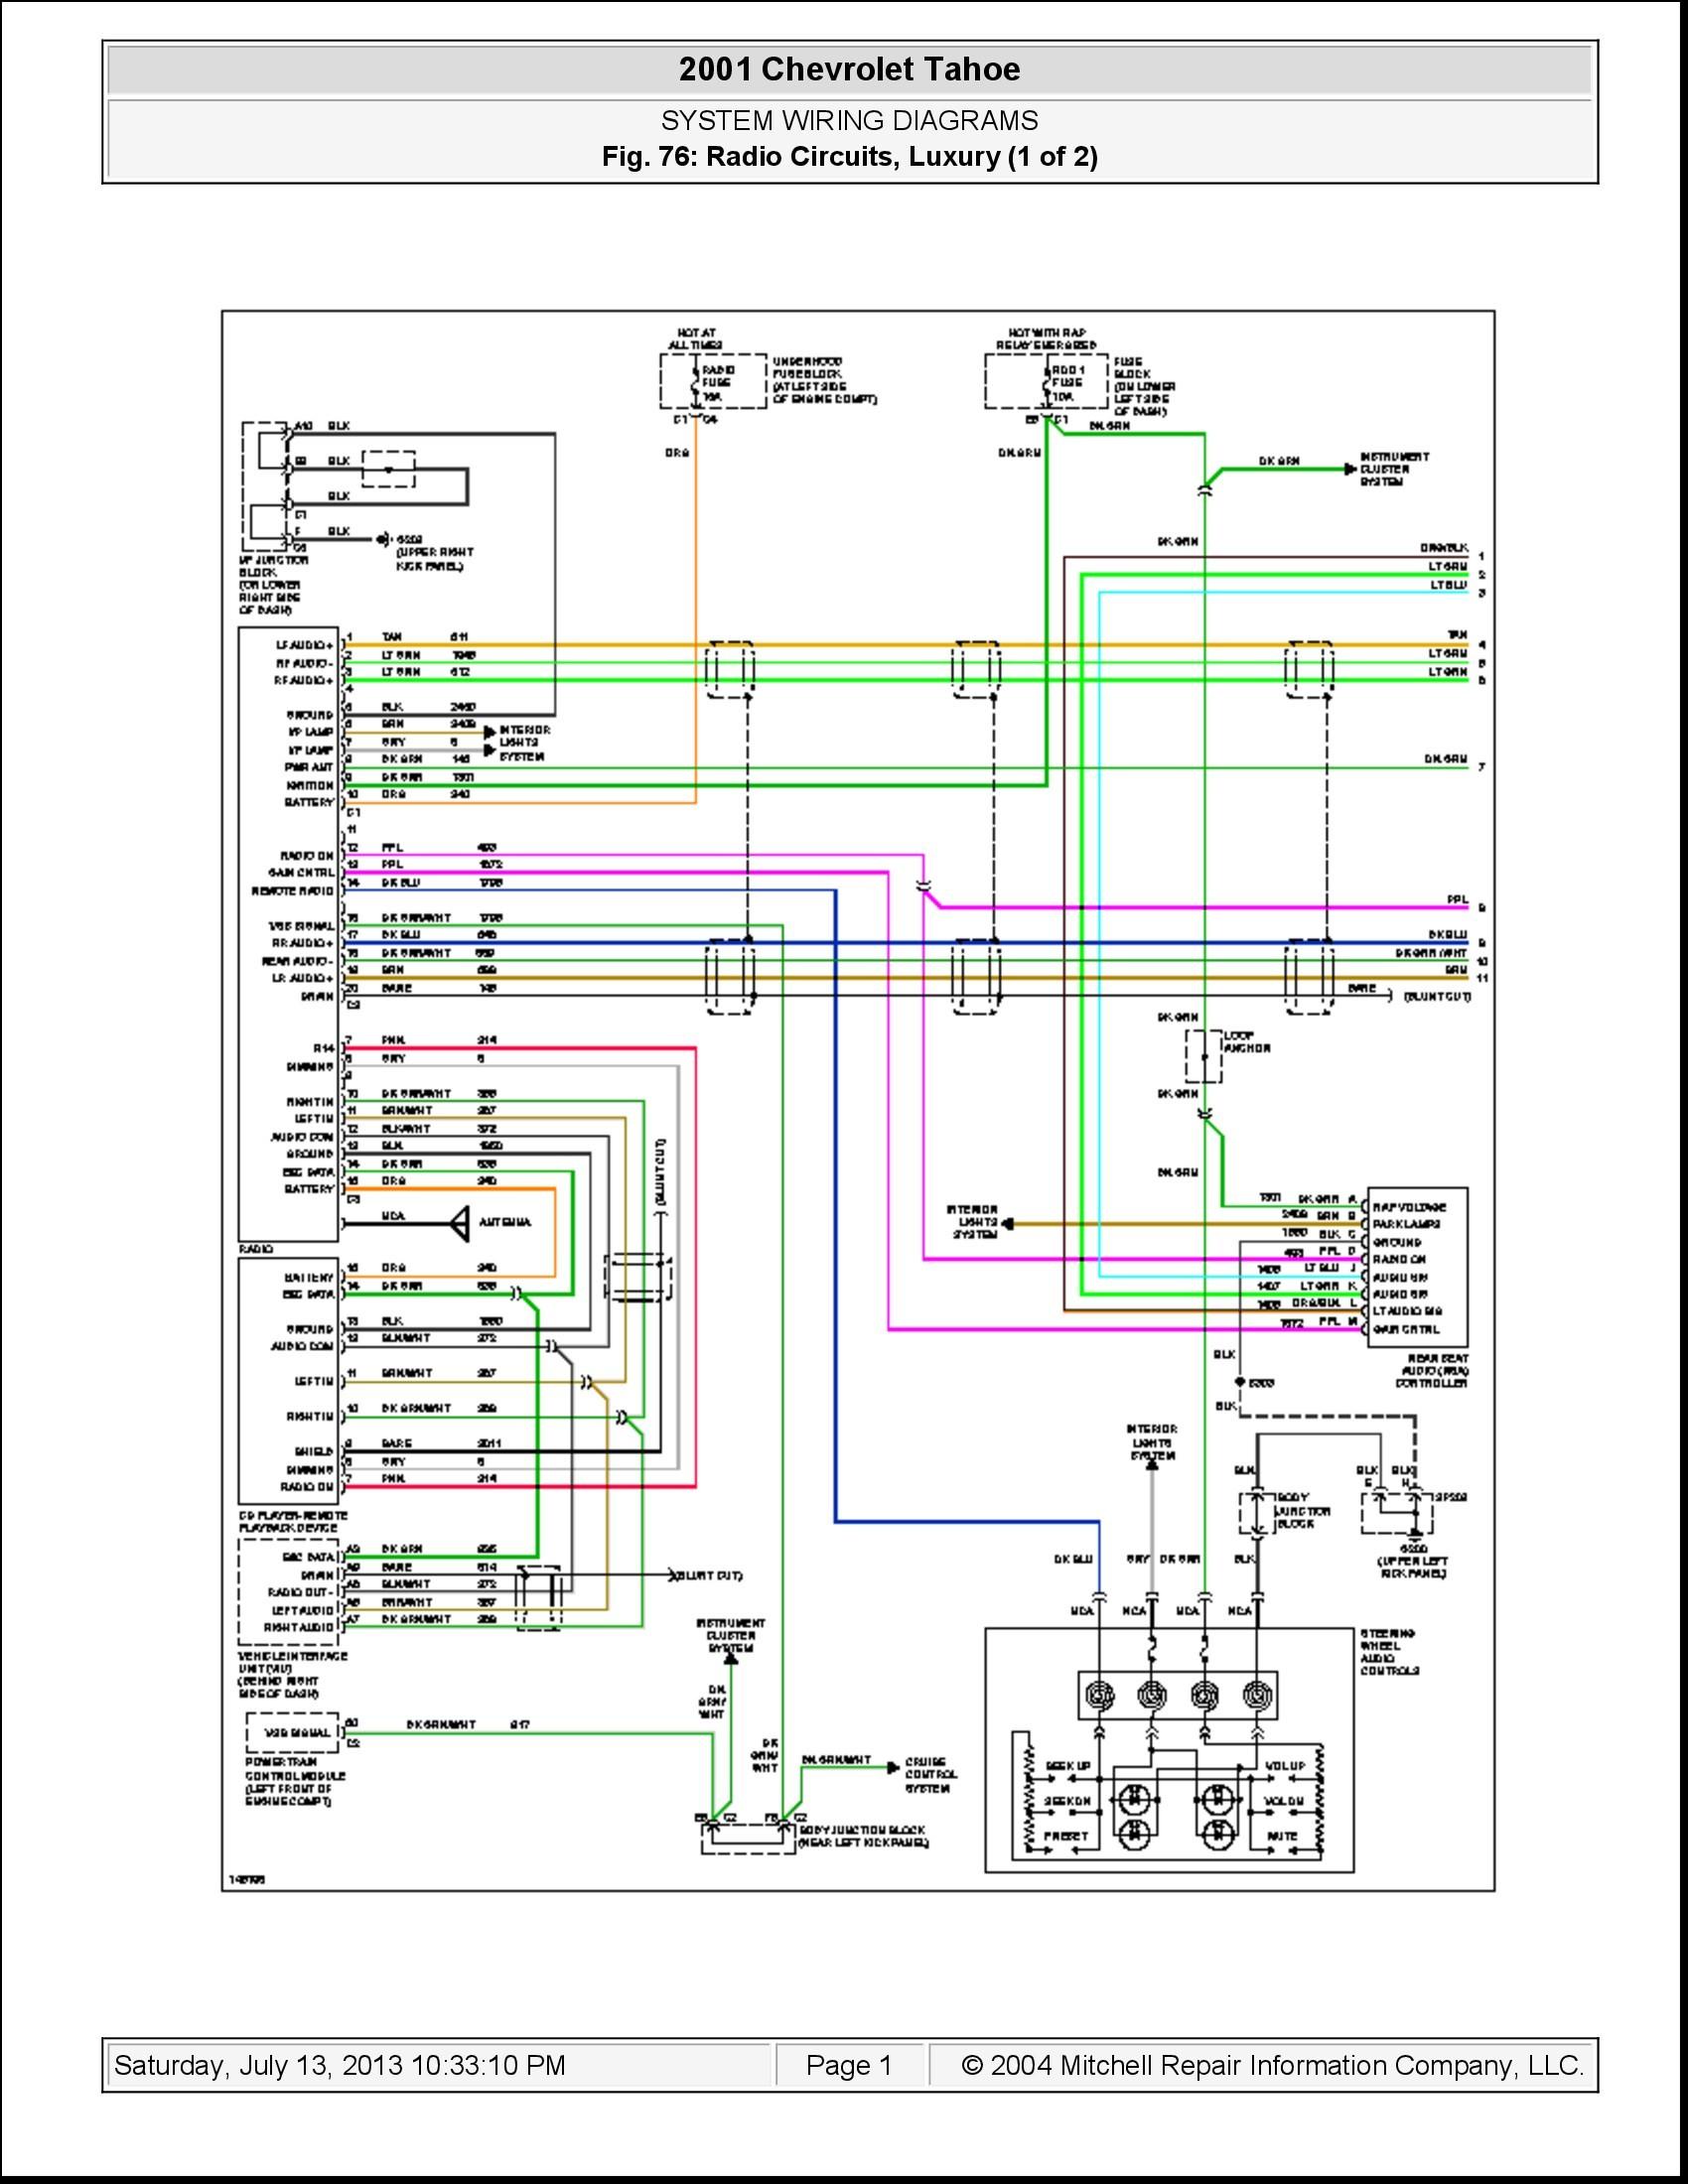 Tahoe Stereo Wiring Diagramstereo Diagram Database Chevrolet Trailblazer Chevy Suburban Radio Wir Full